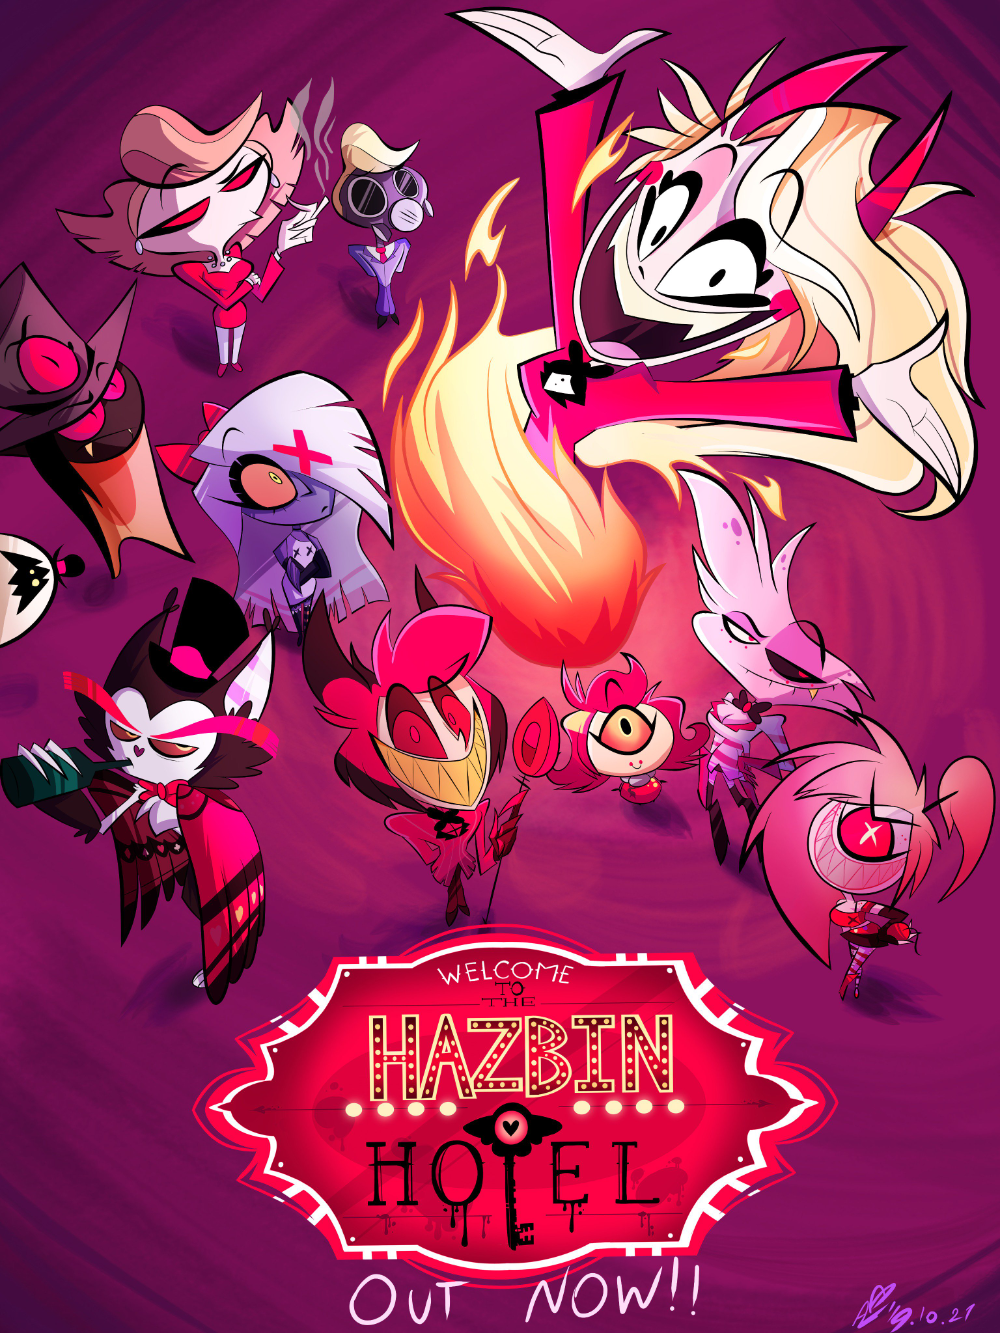 Areg S. on in 2020 Anime sketch, Anime, Vivziepop hazbin